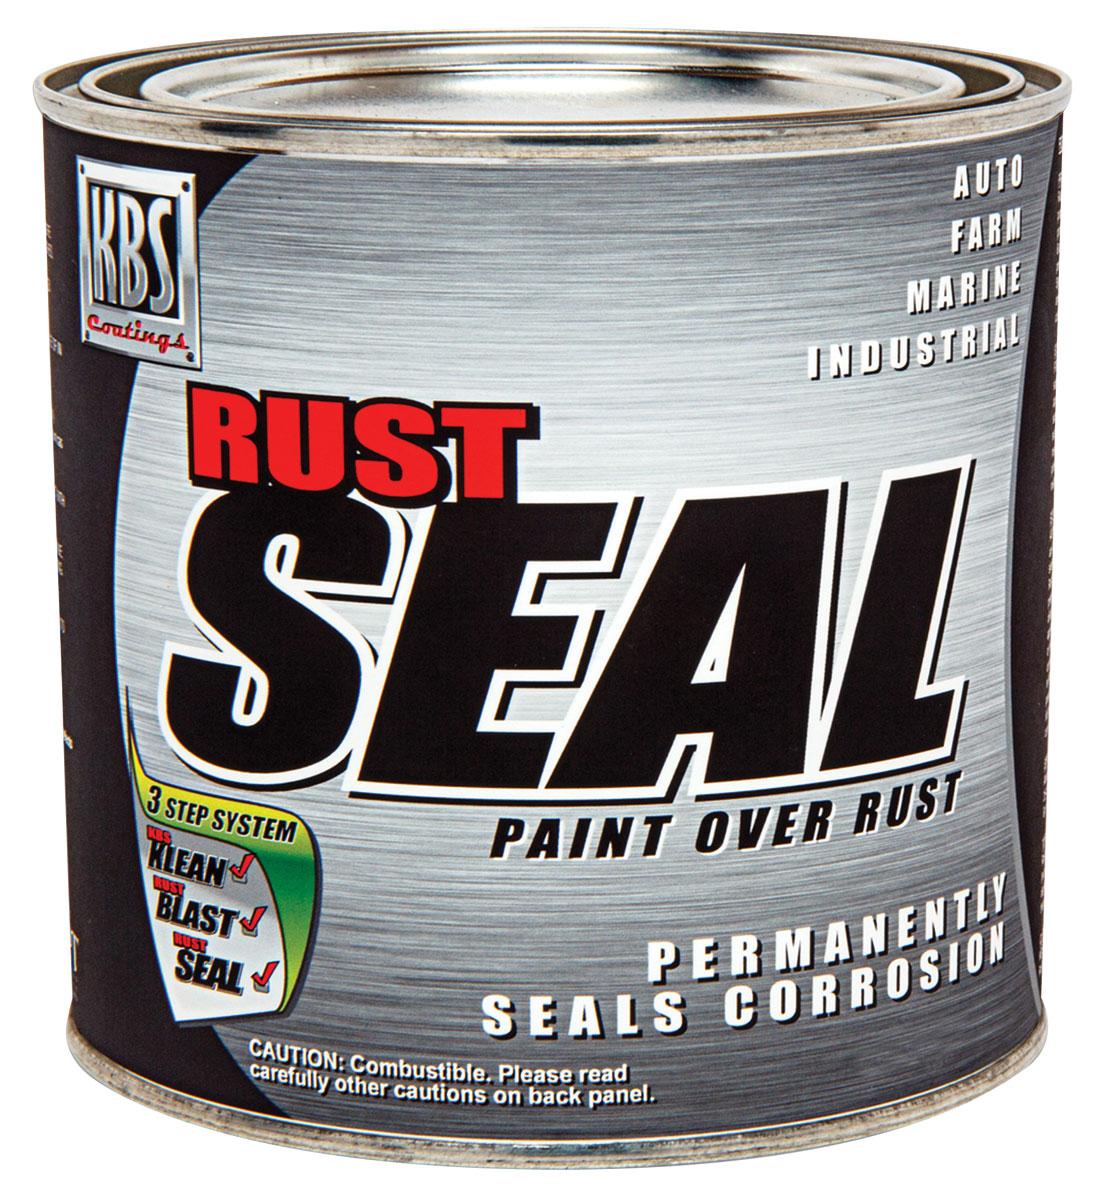 Paint, KBS RustSeal, Preventative Coating